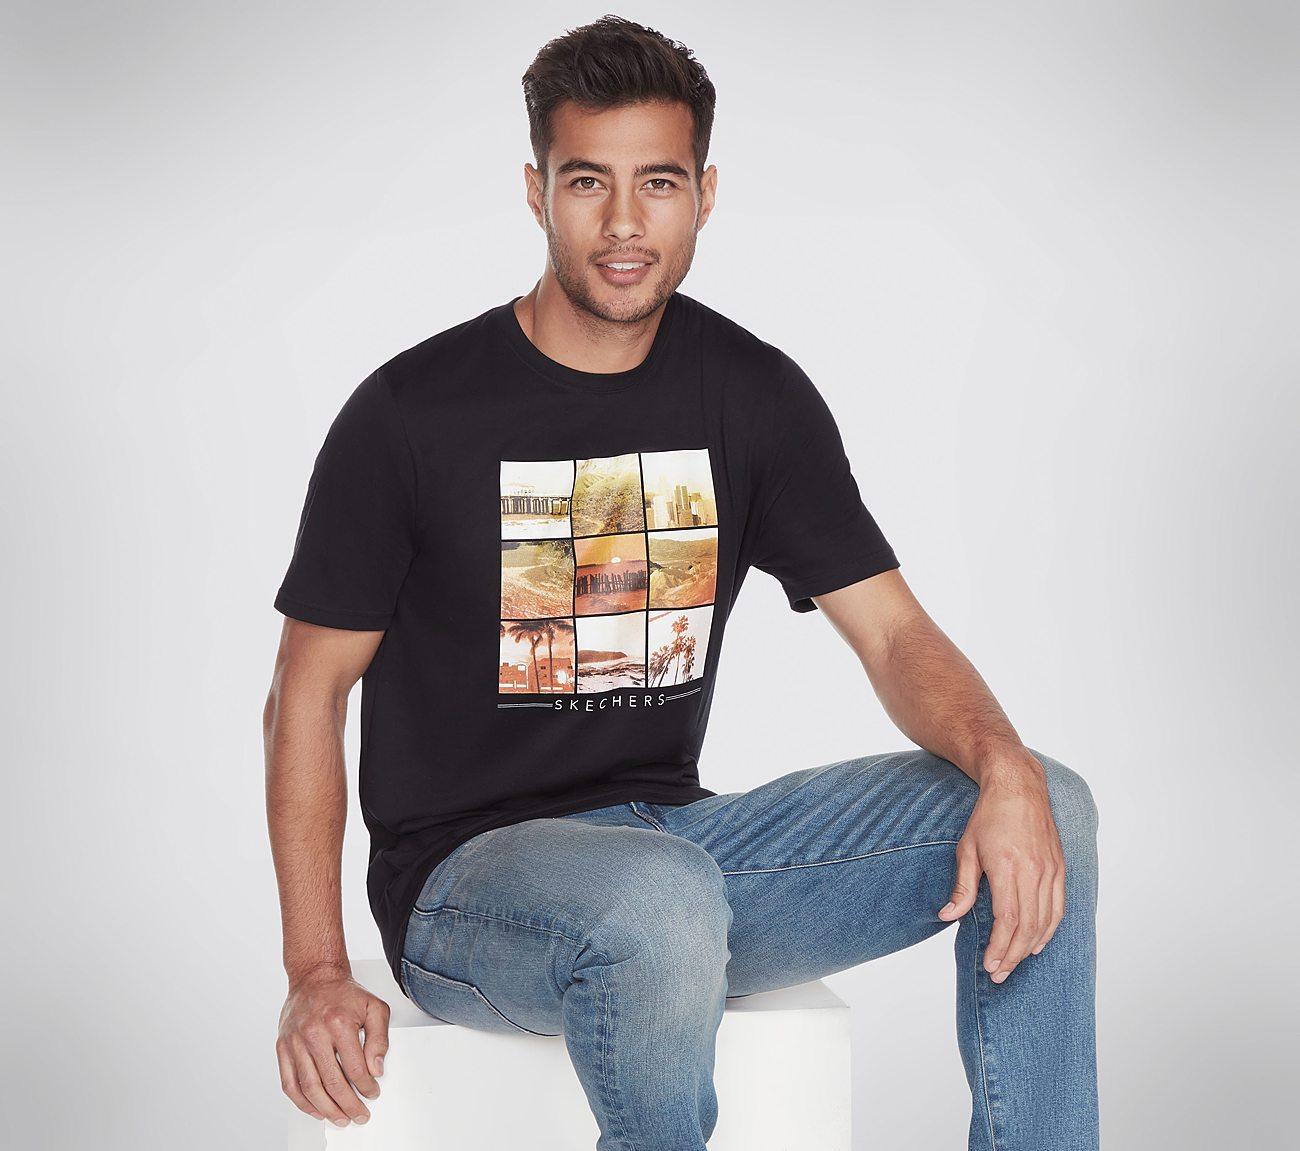 Skechers Apparel Terrain Tee Shirt